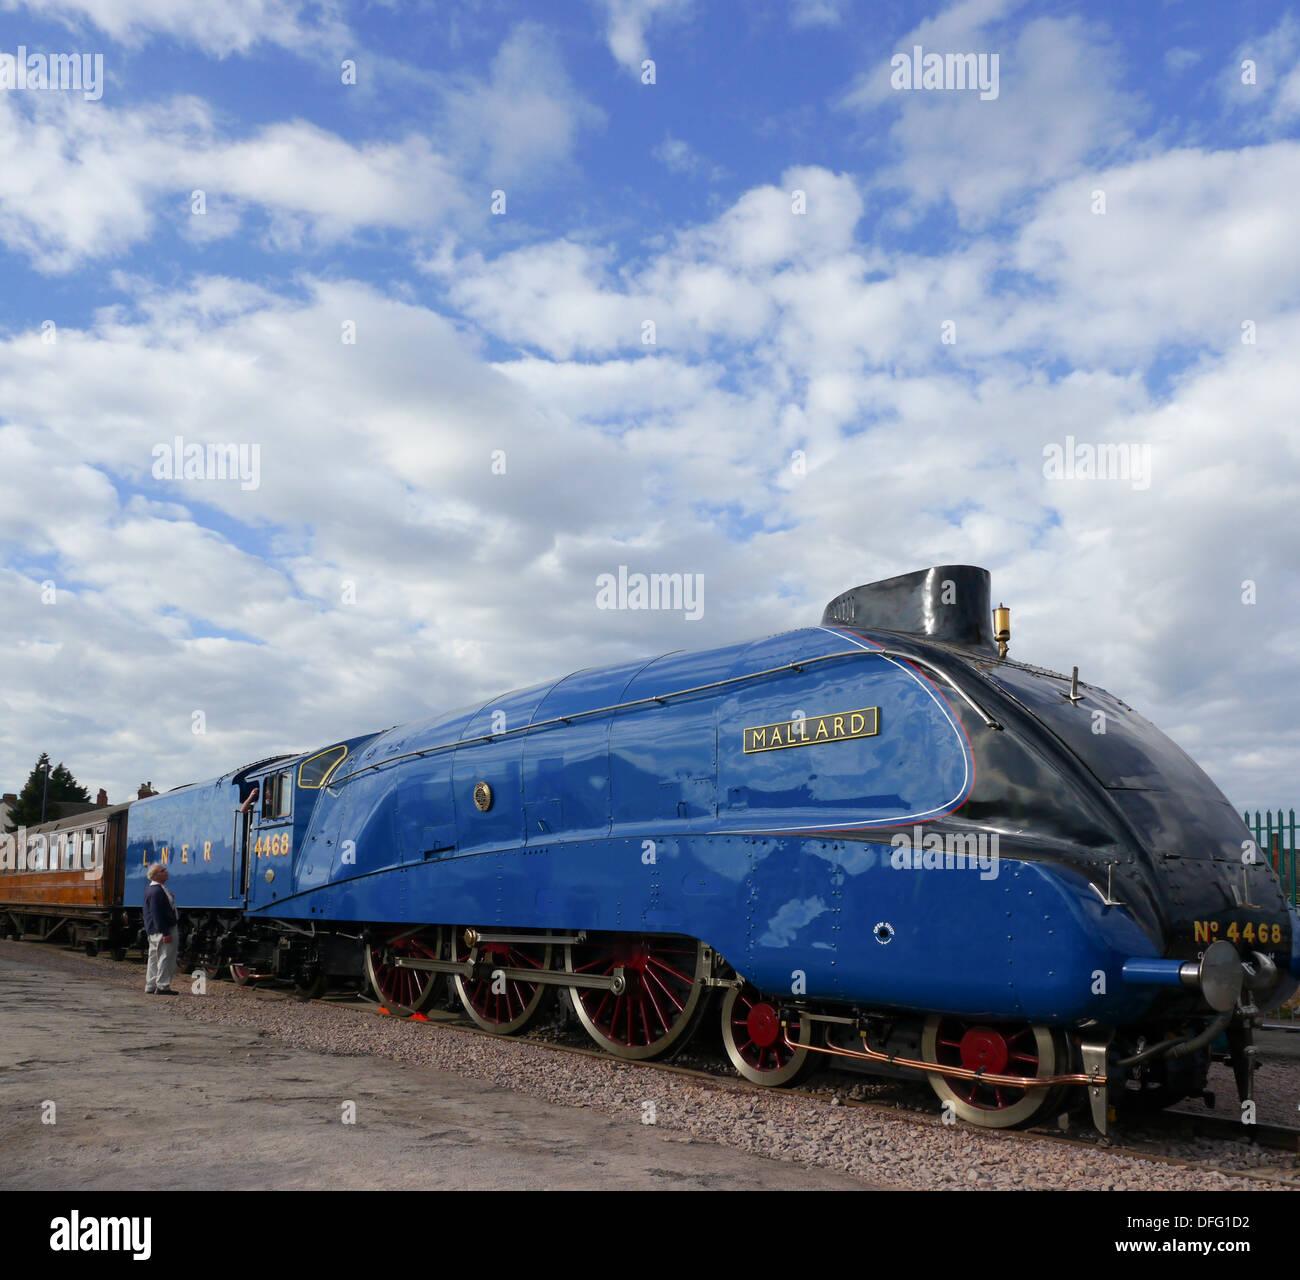 'The Mallard' A4 Pacific locomotive. - Stock Image